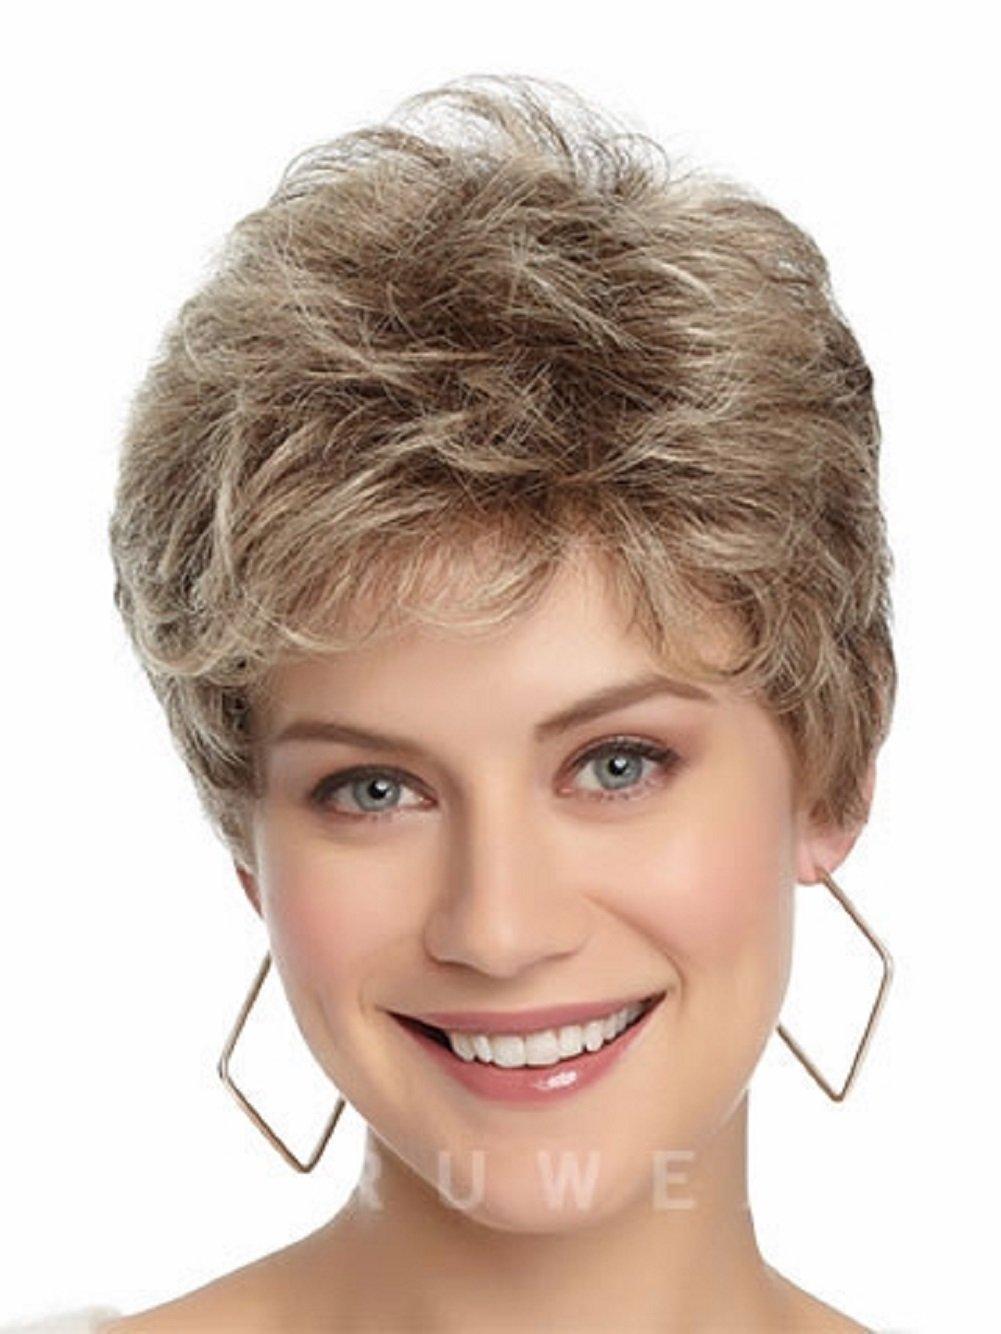 Raquel Welch Flirt-p Gl10-12 Wig by Hairuwear